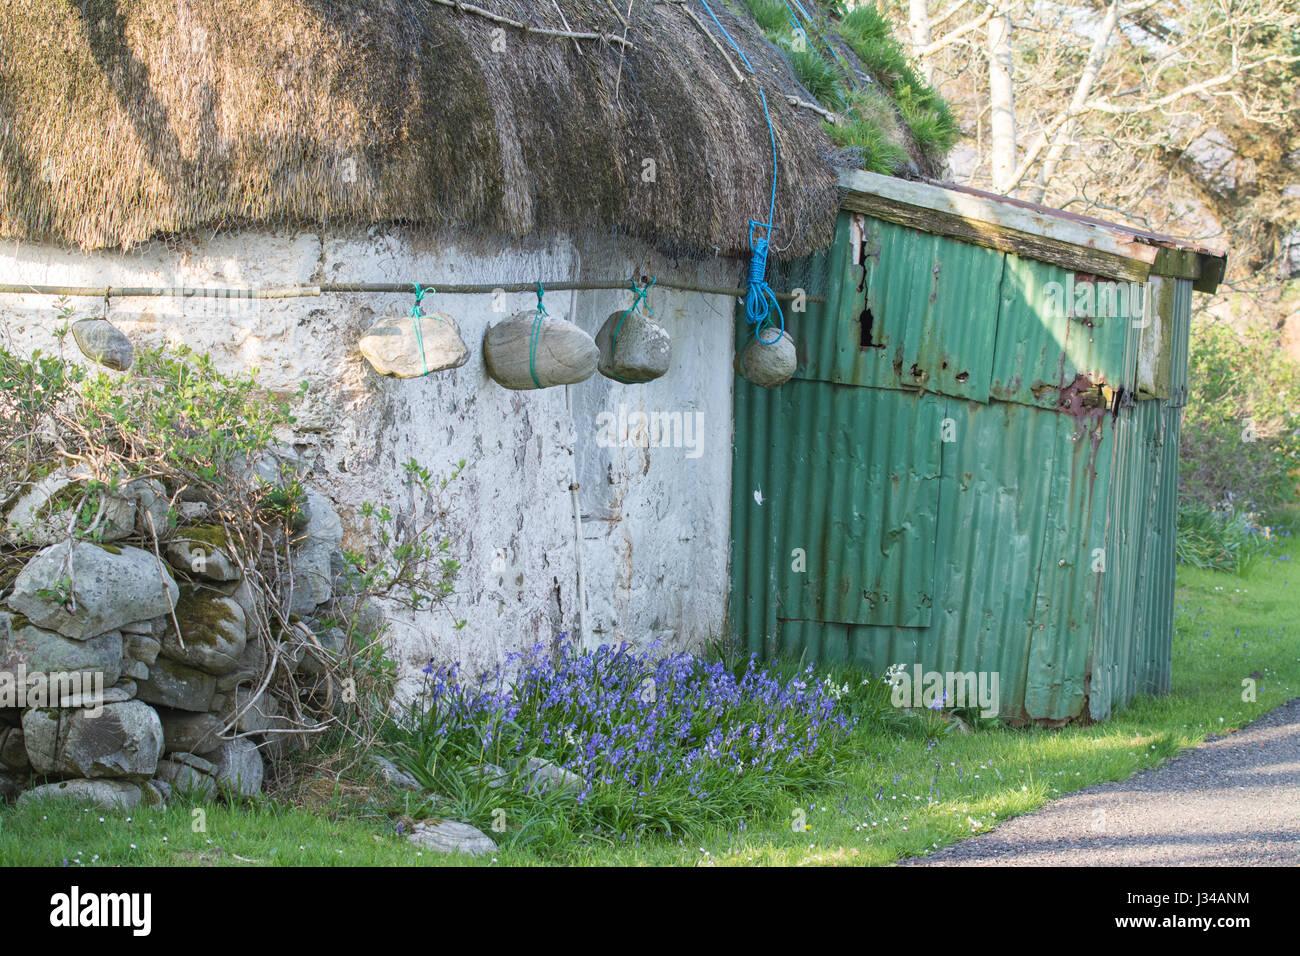 Thatched cottage - detail of last intact traditional Lochalsh cottage, Lower Ardelve, Lochalsh, Highland, Scotland Stock Photo